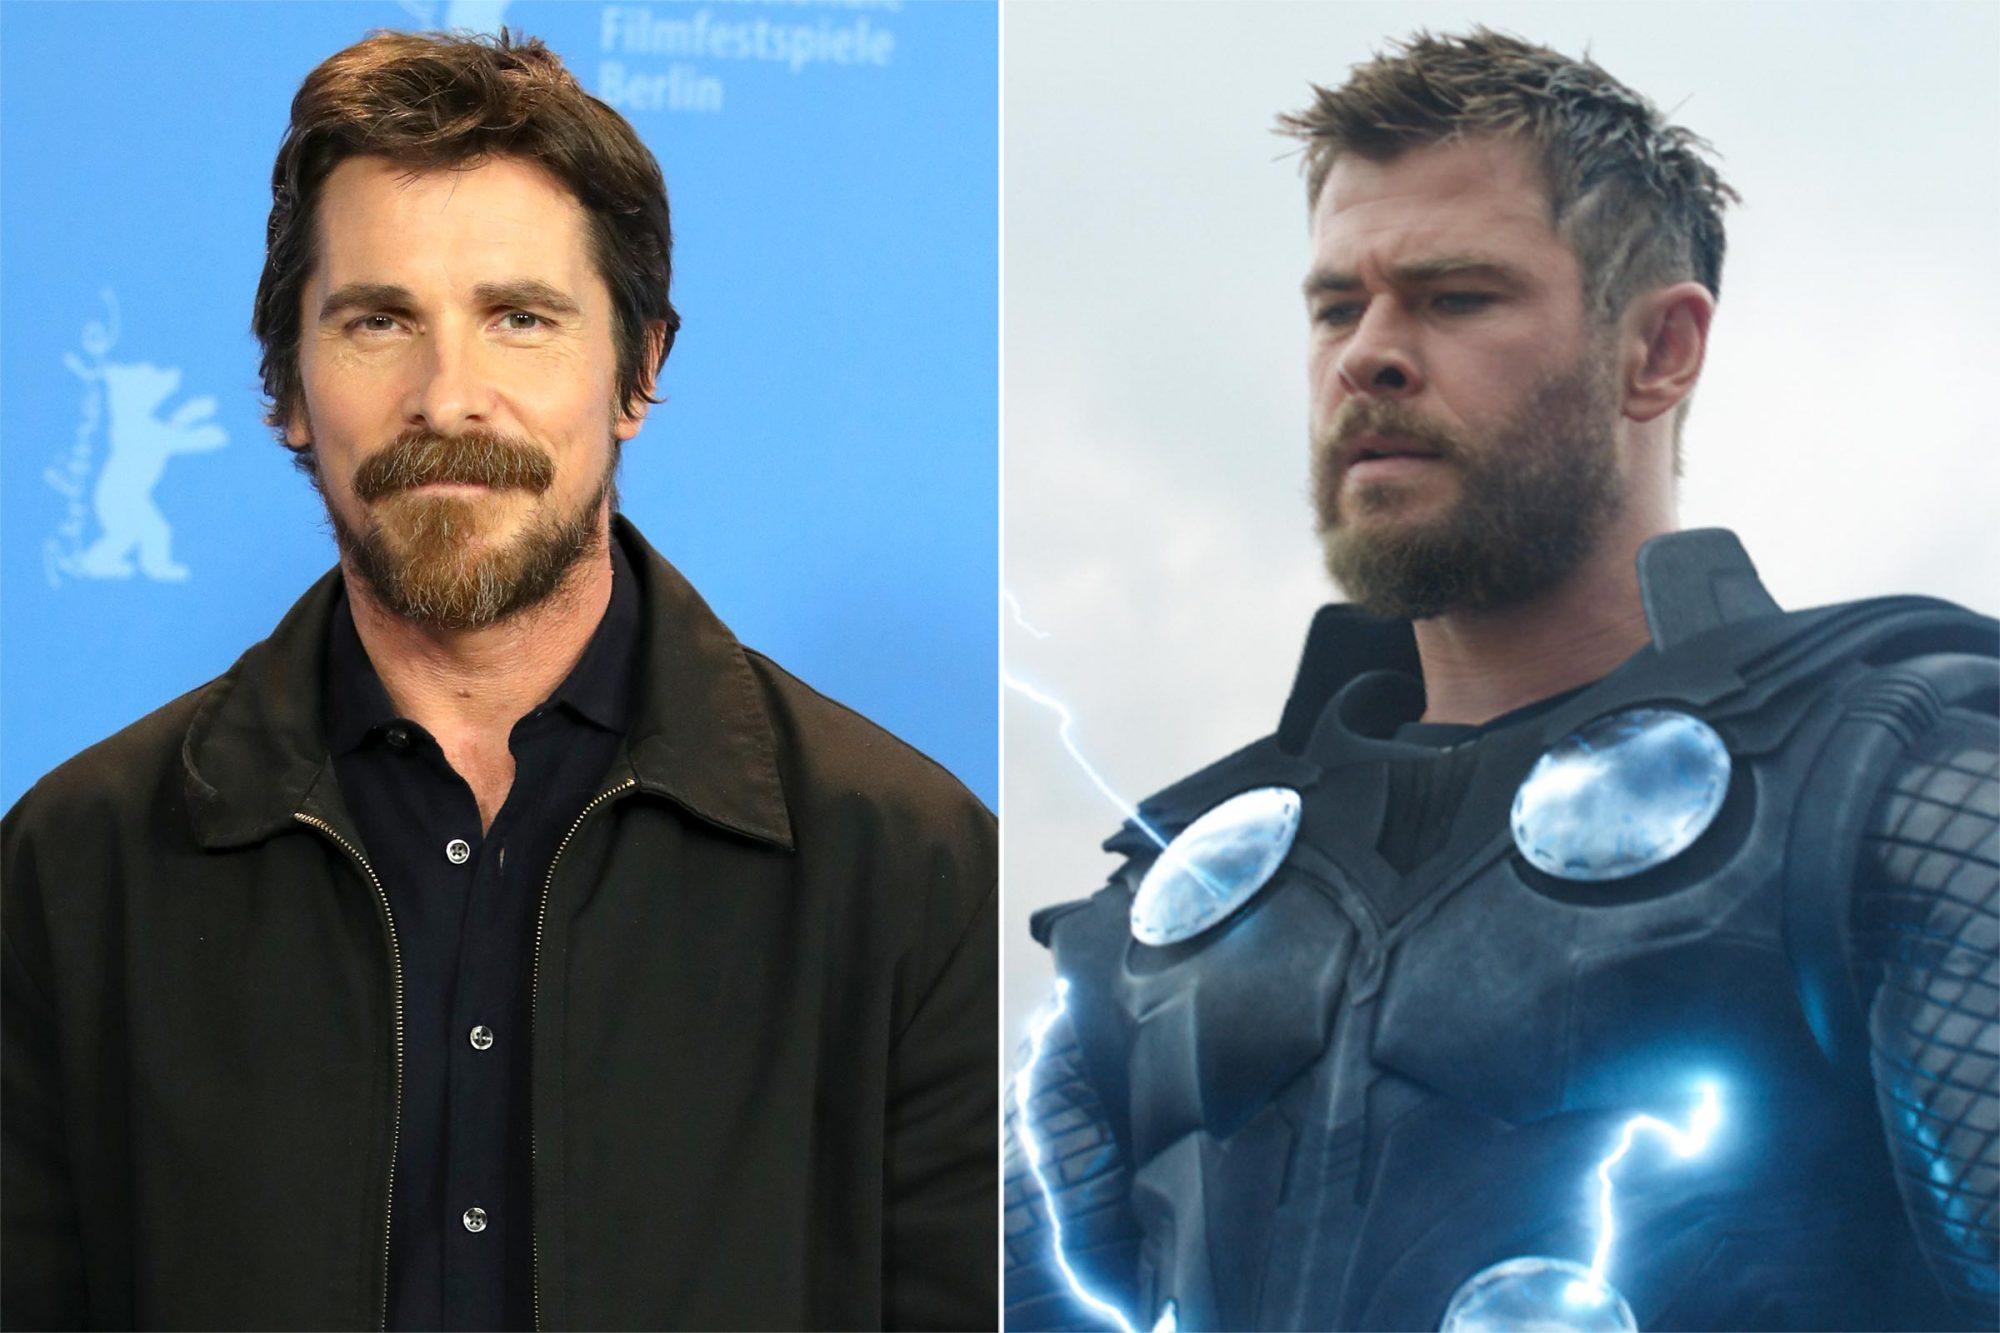 Christian Bale / Thor